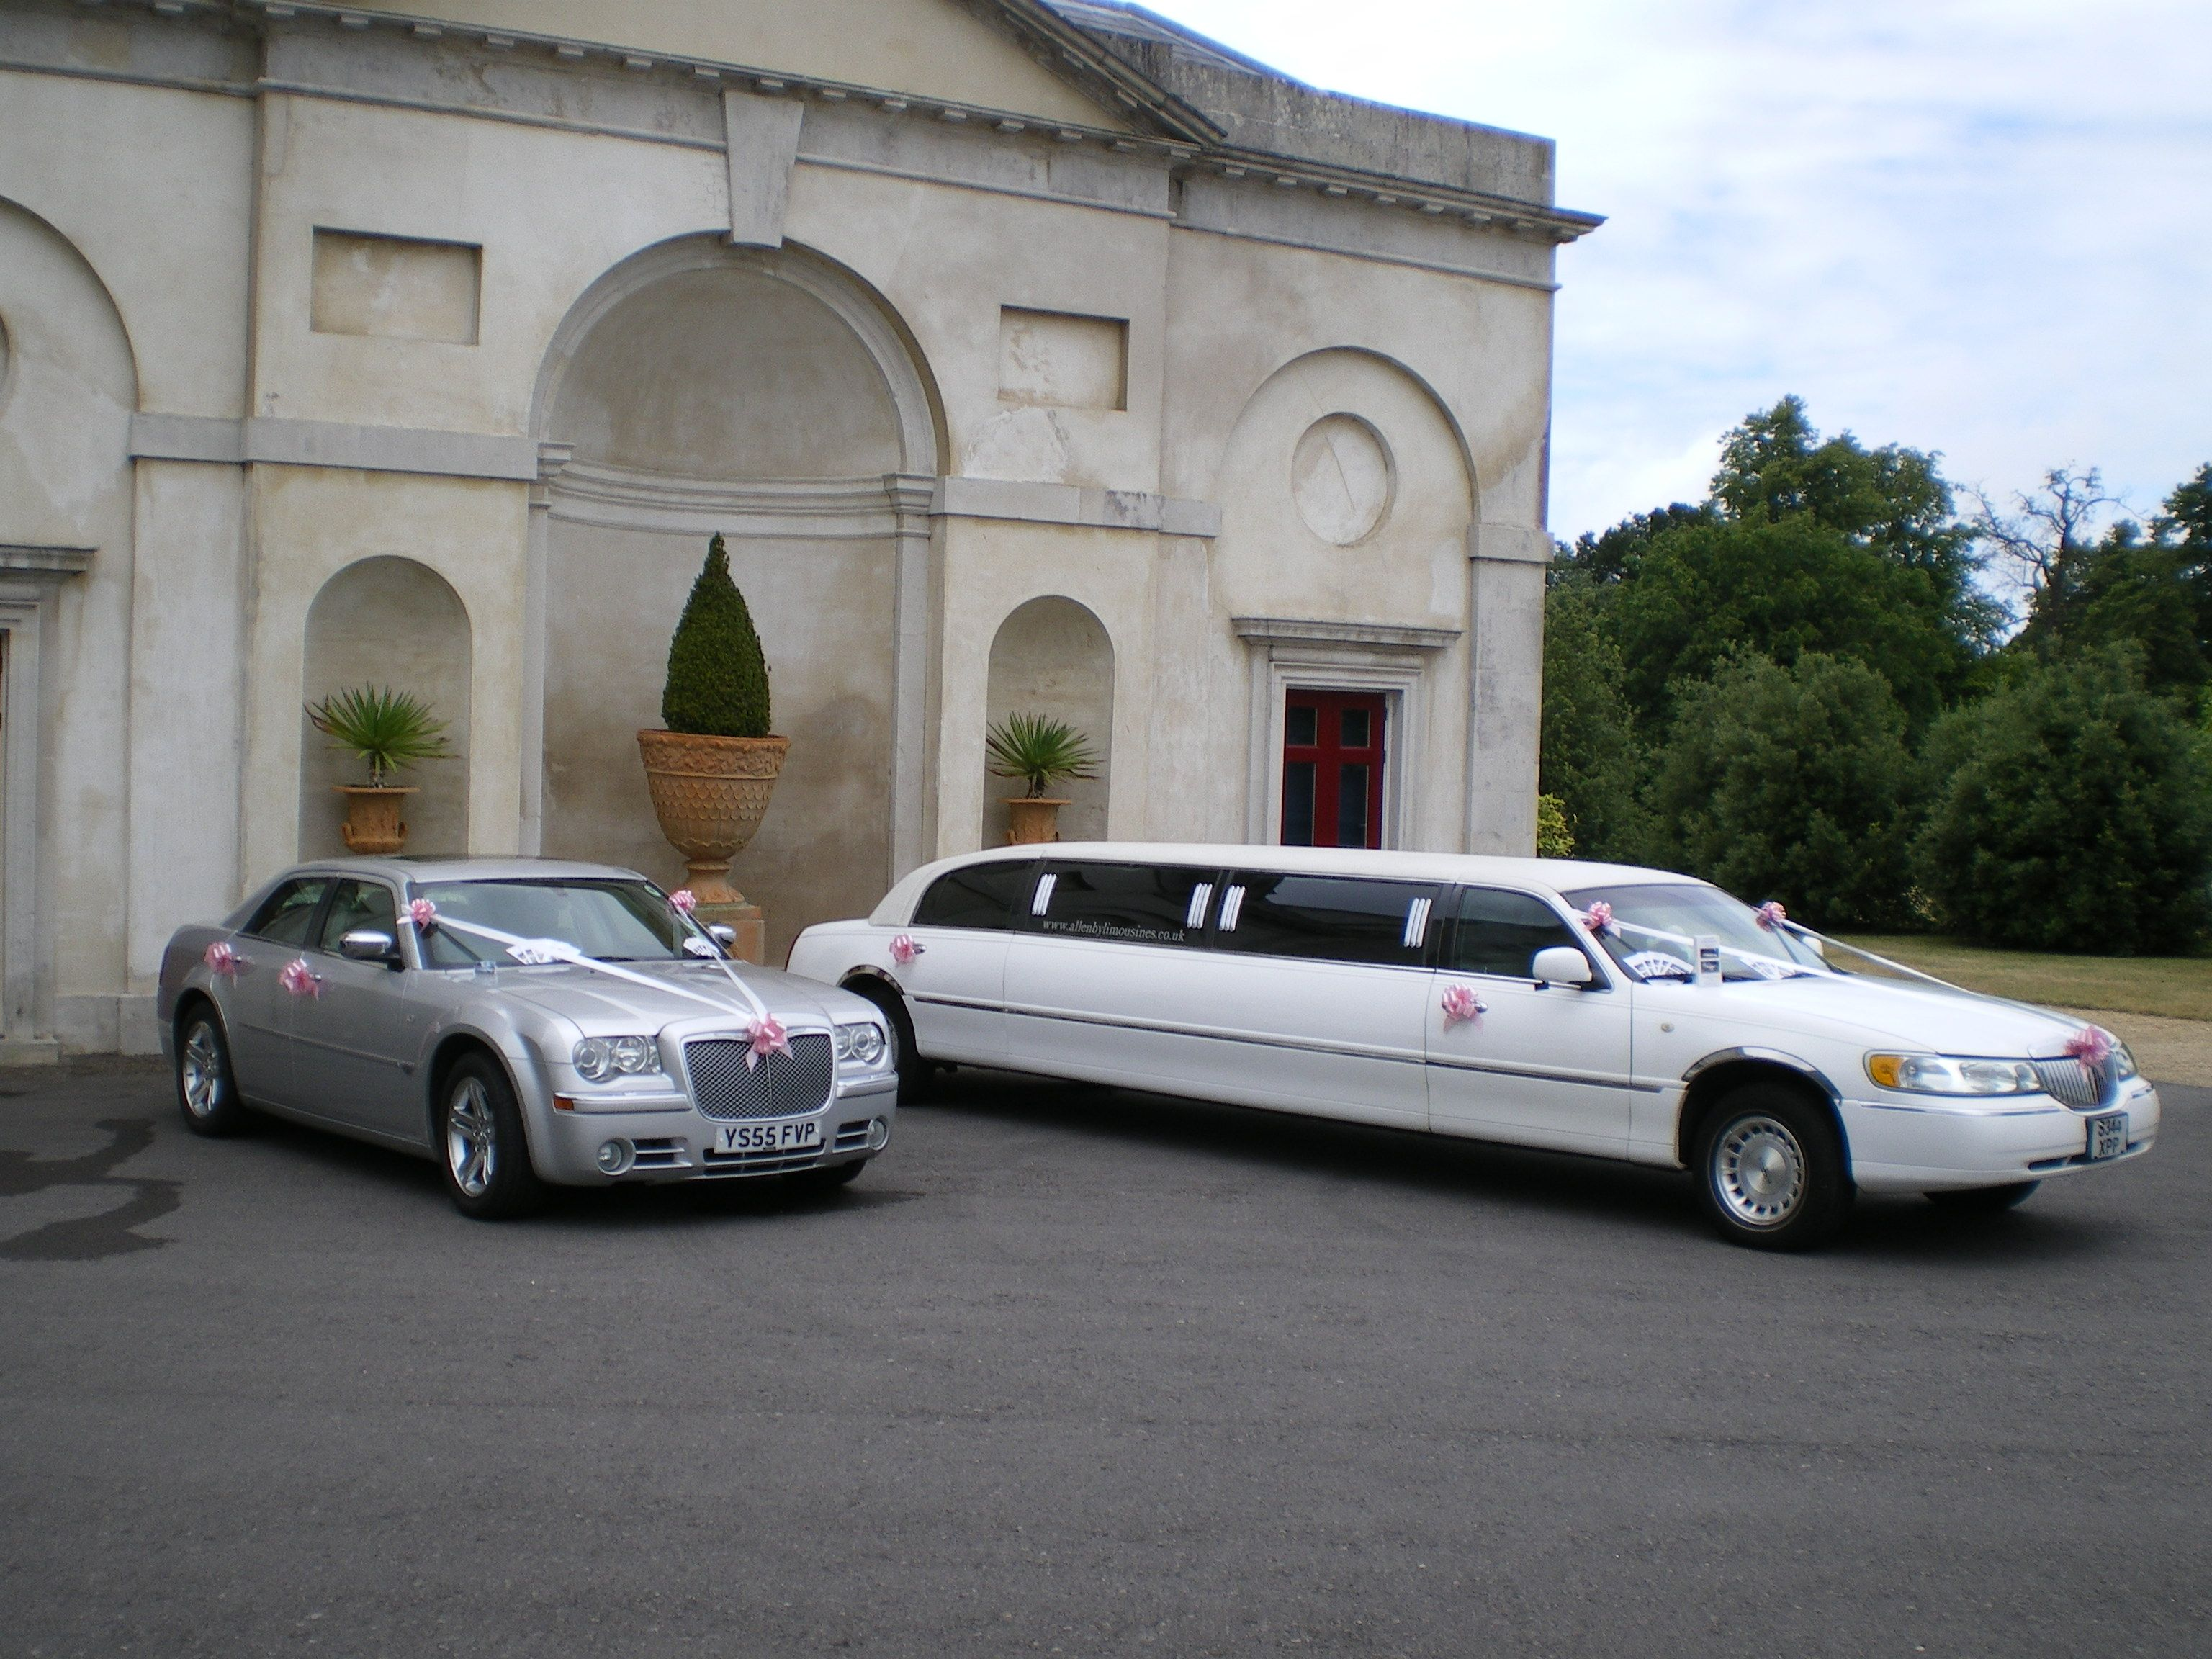 Affordable limousine service limousine airport